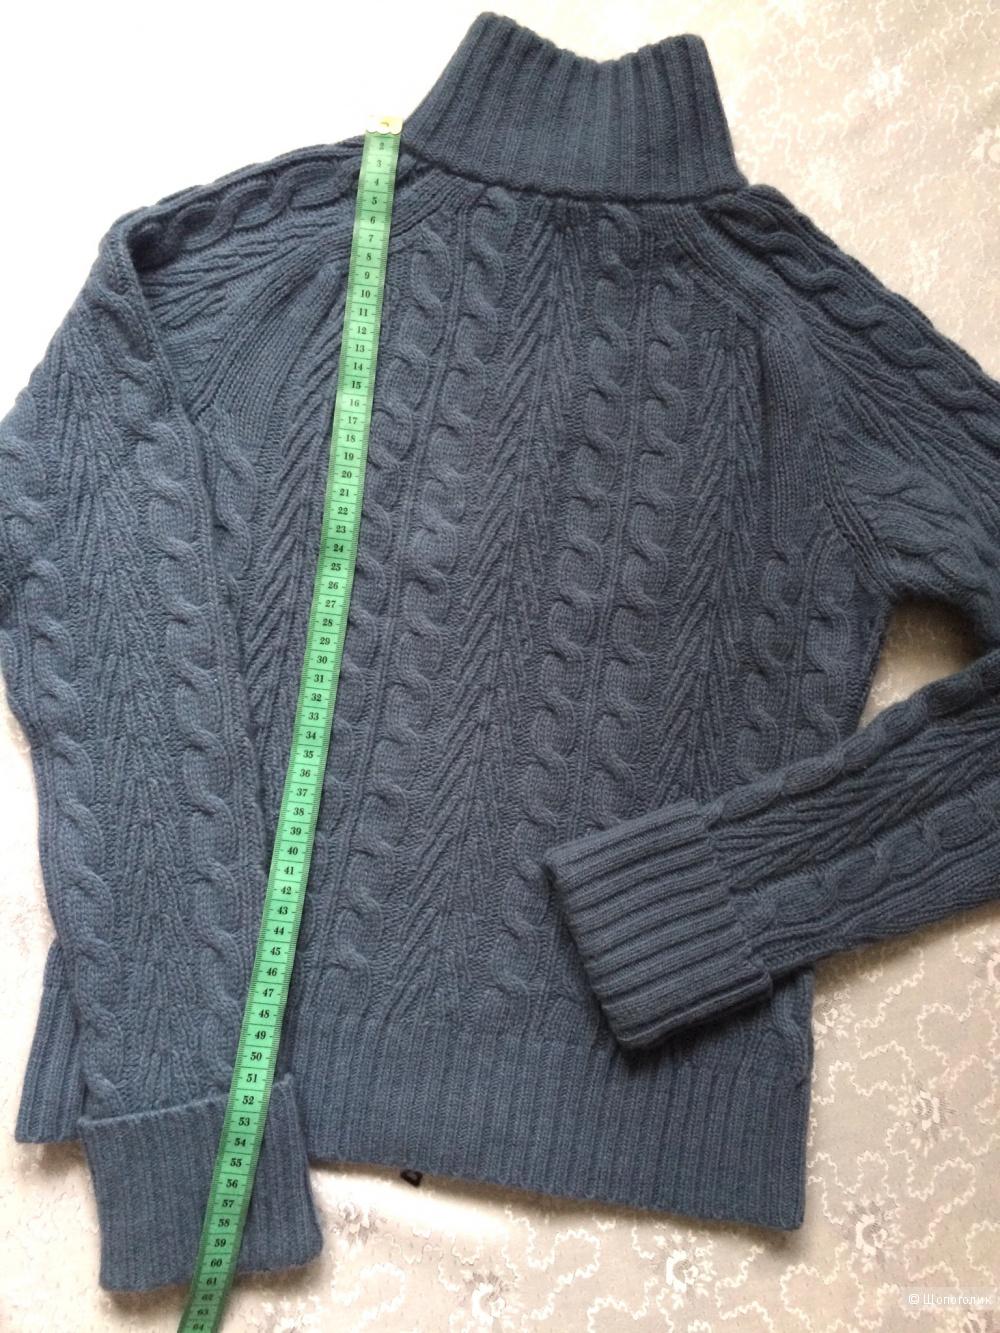 Сет из двух вещей: Кардиган iBlues + свитер West Point 42-44